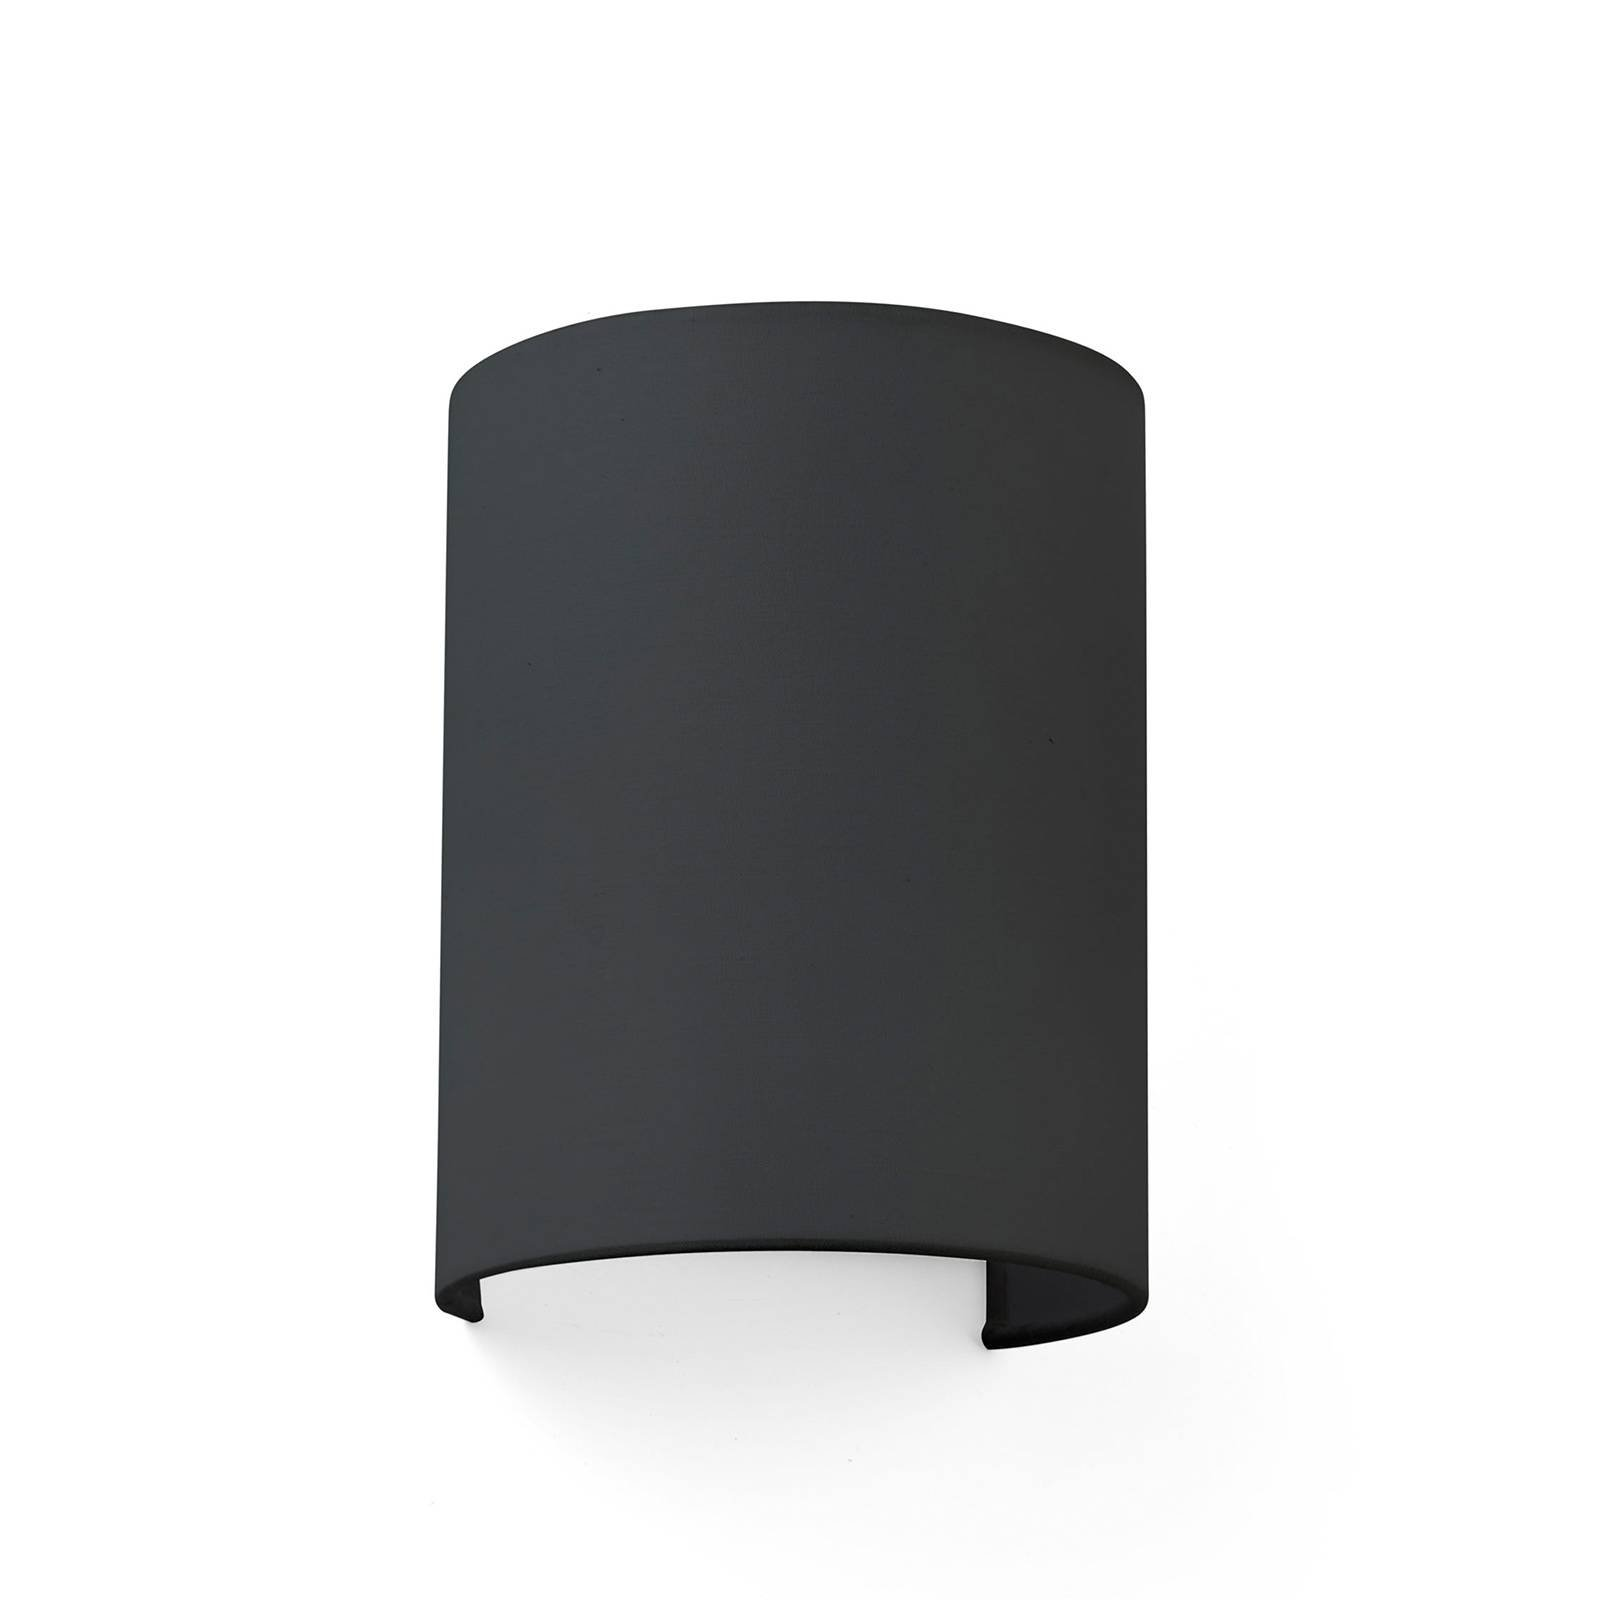 Vegglampe Cotton, buet, 20 x 15 cm, svart